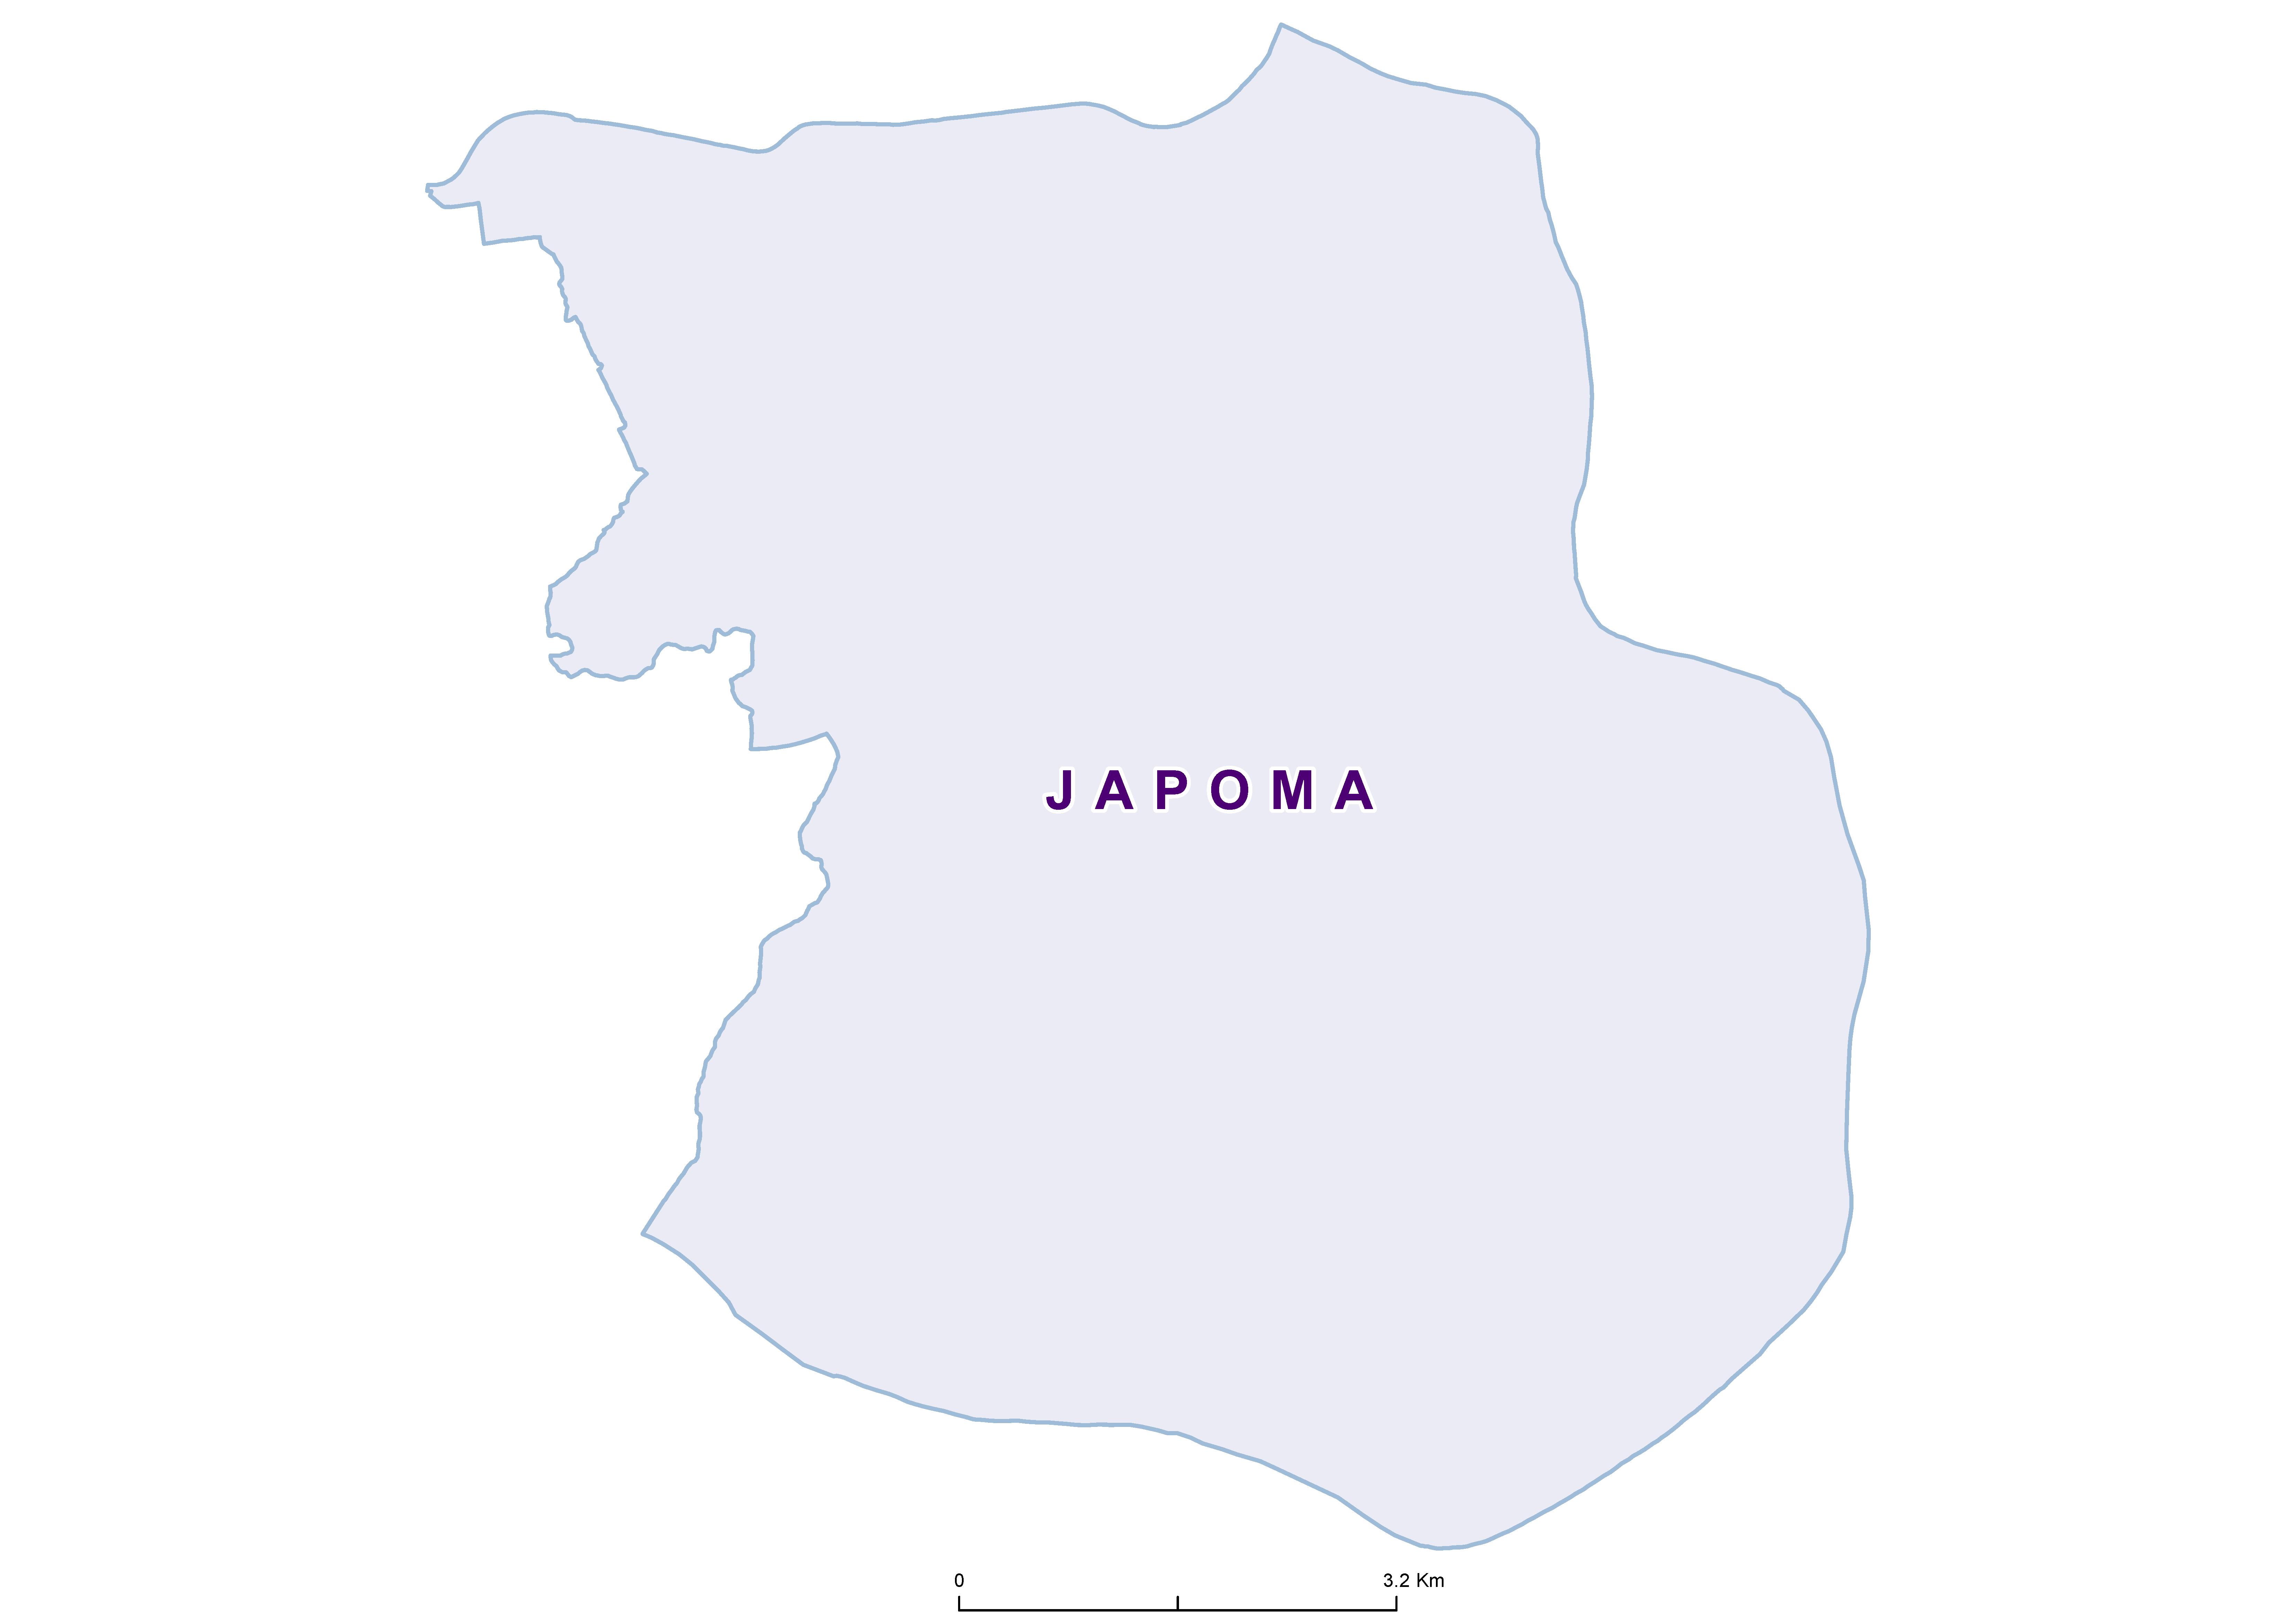 Japoma Mean STH 19850001